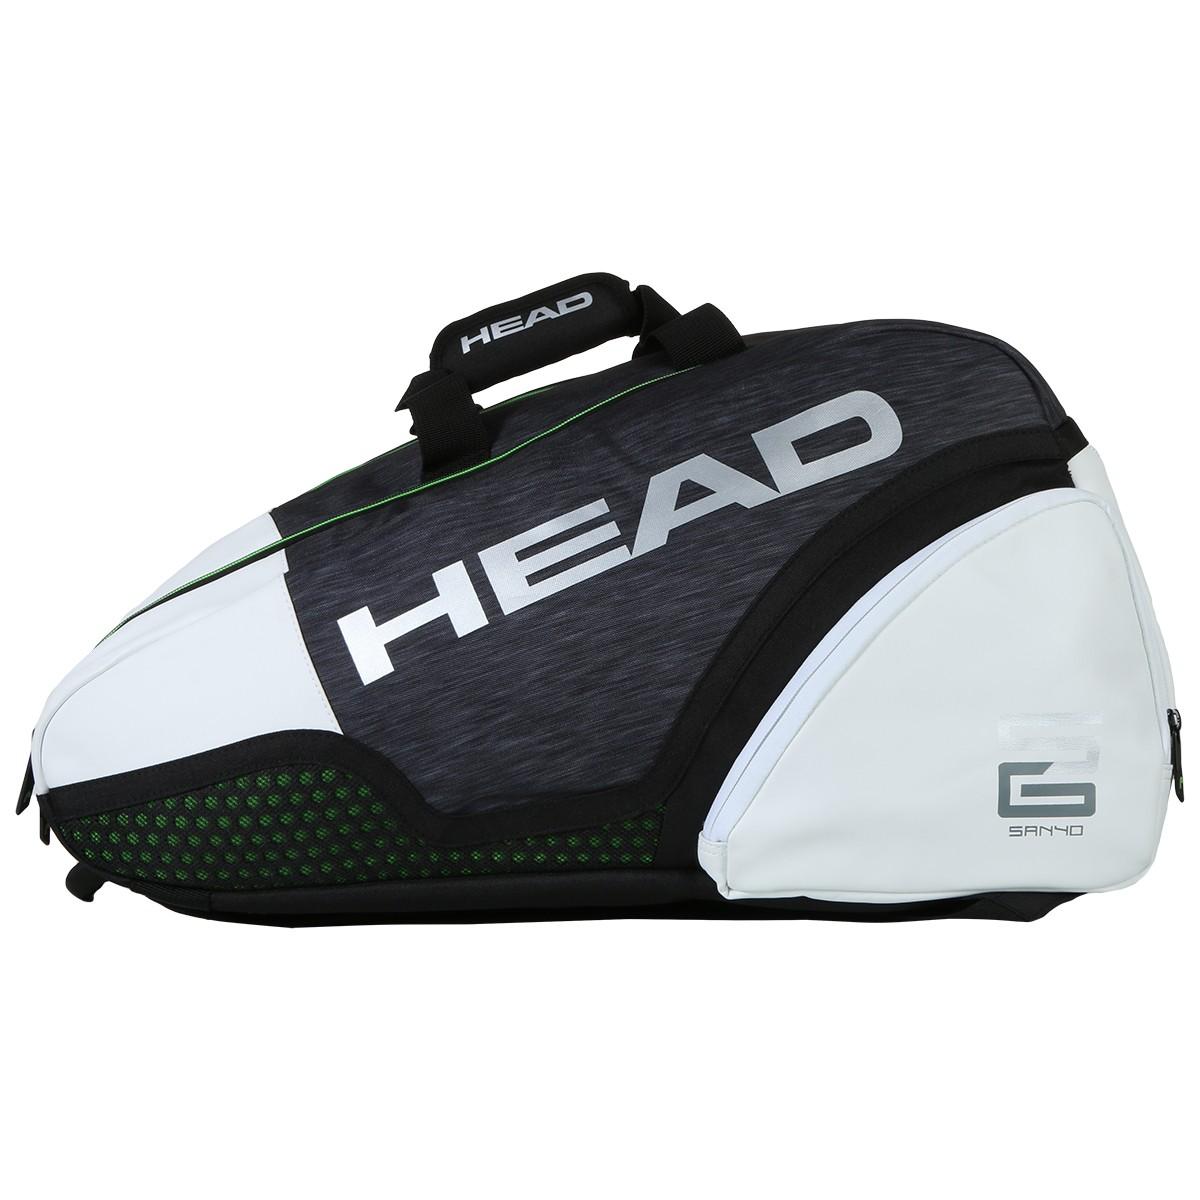 HEAD ALPHA SANYO SUPERCOMBI PADEL BAG - HEAD - Padel Bags - Padel